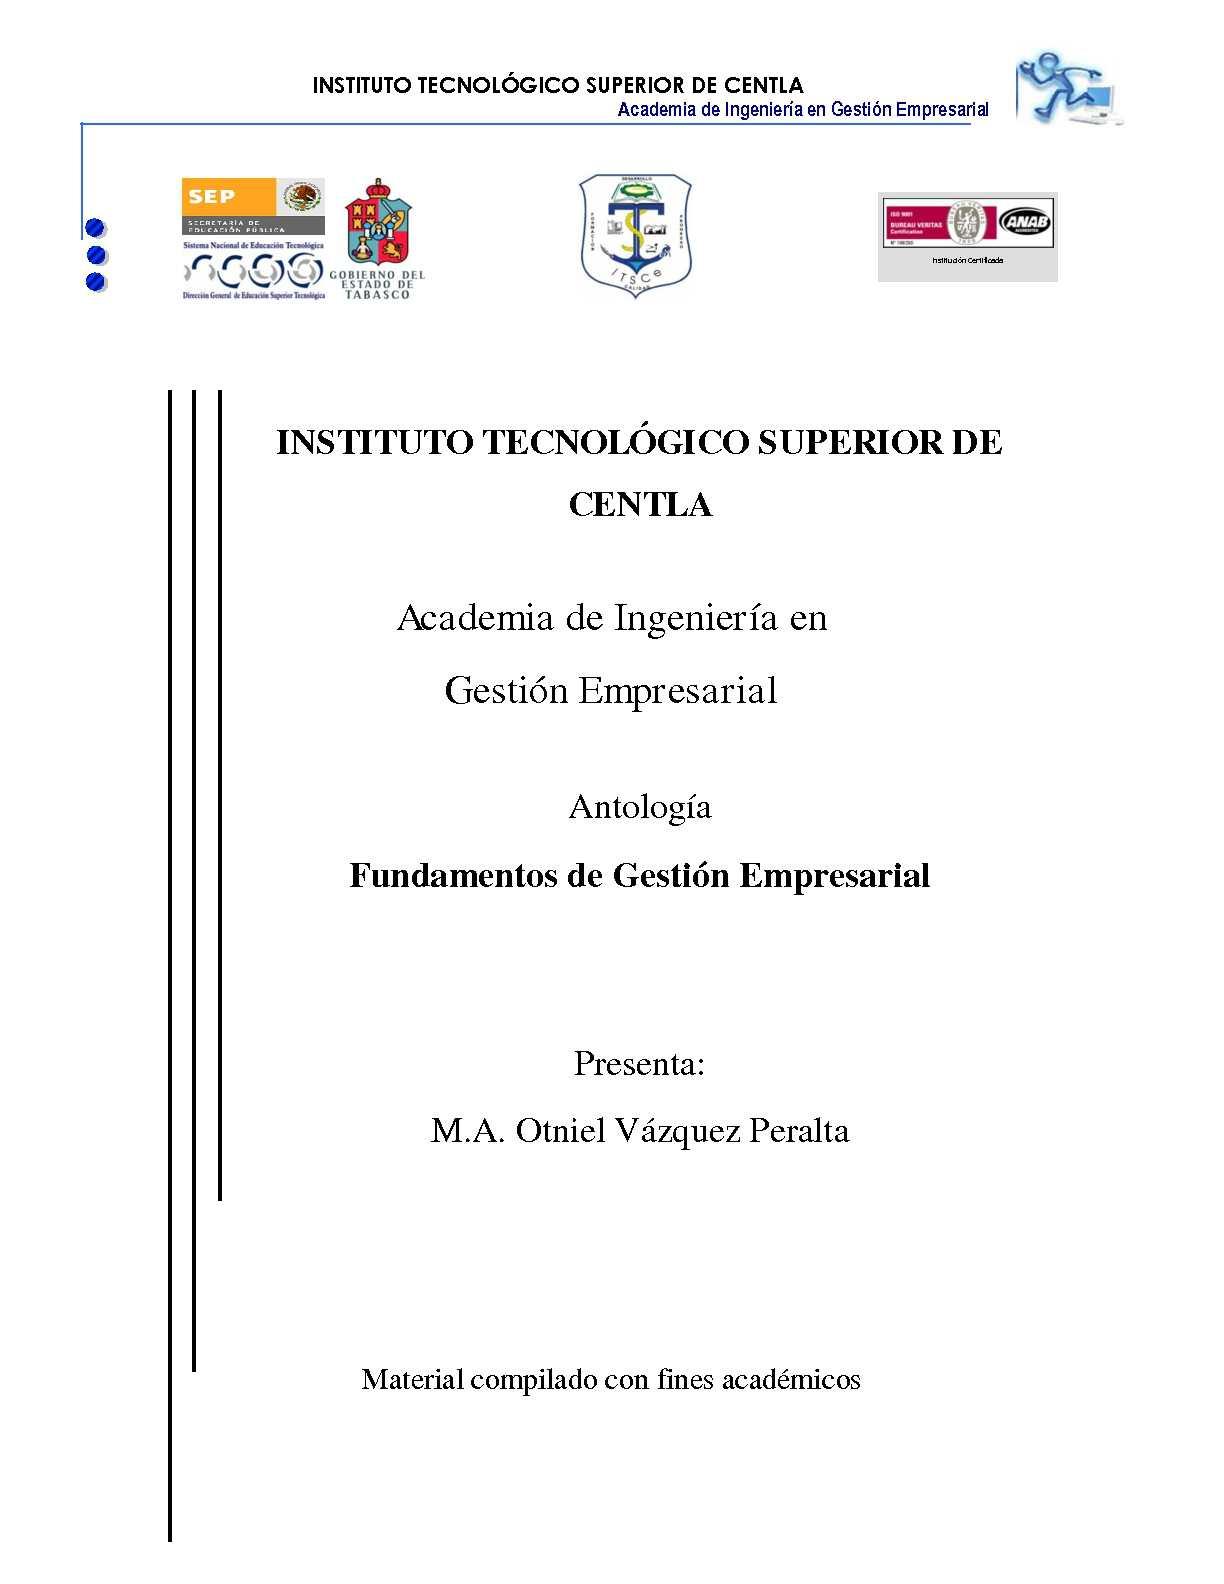 Calaméo - Antologia de Gestion Empresarial